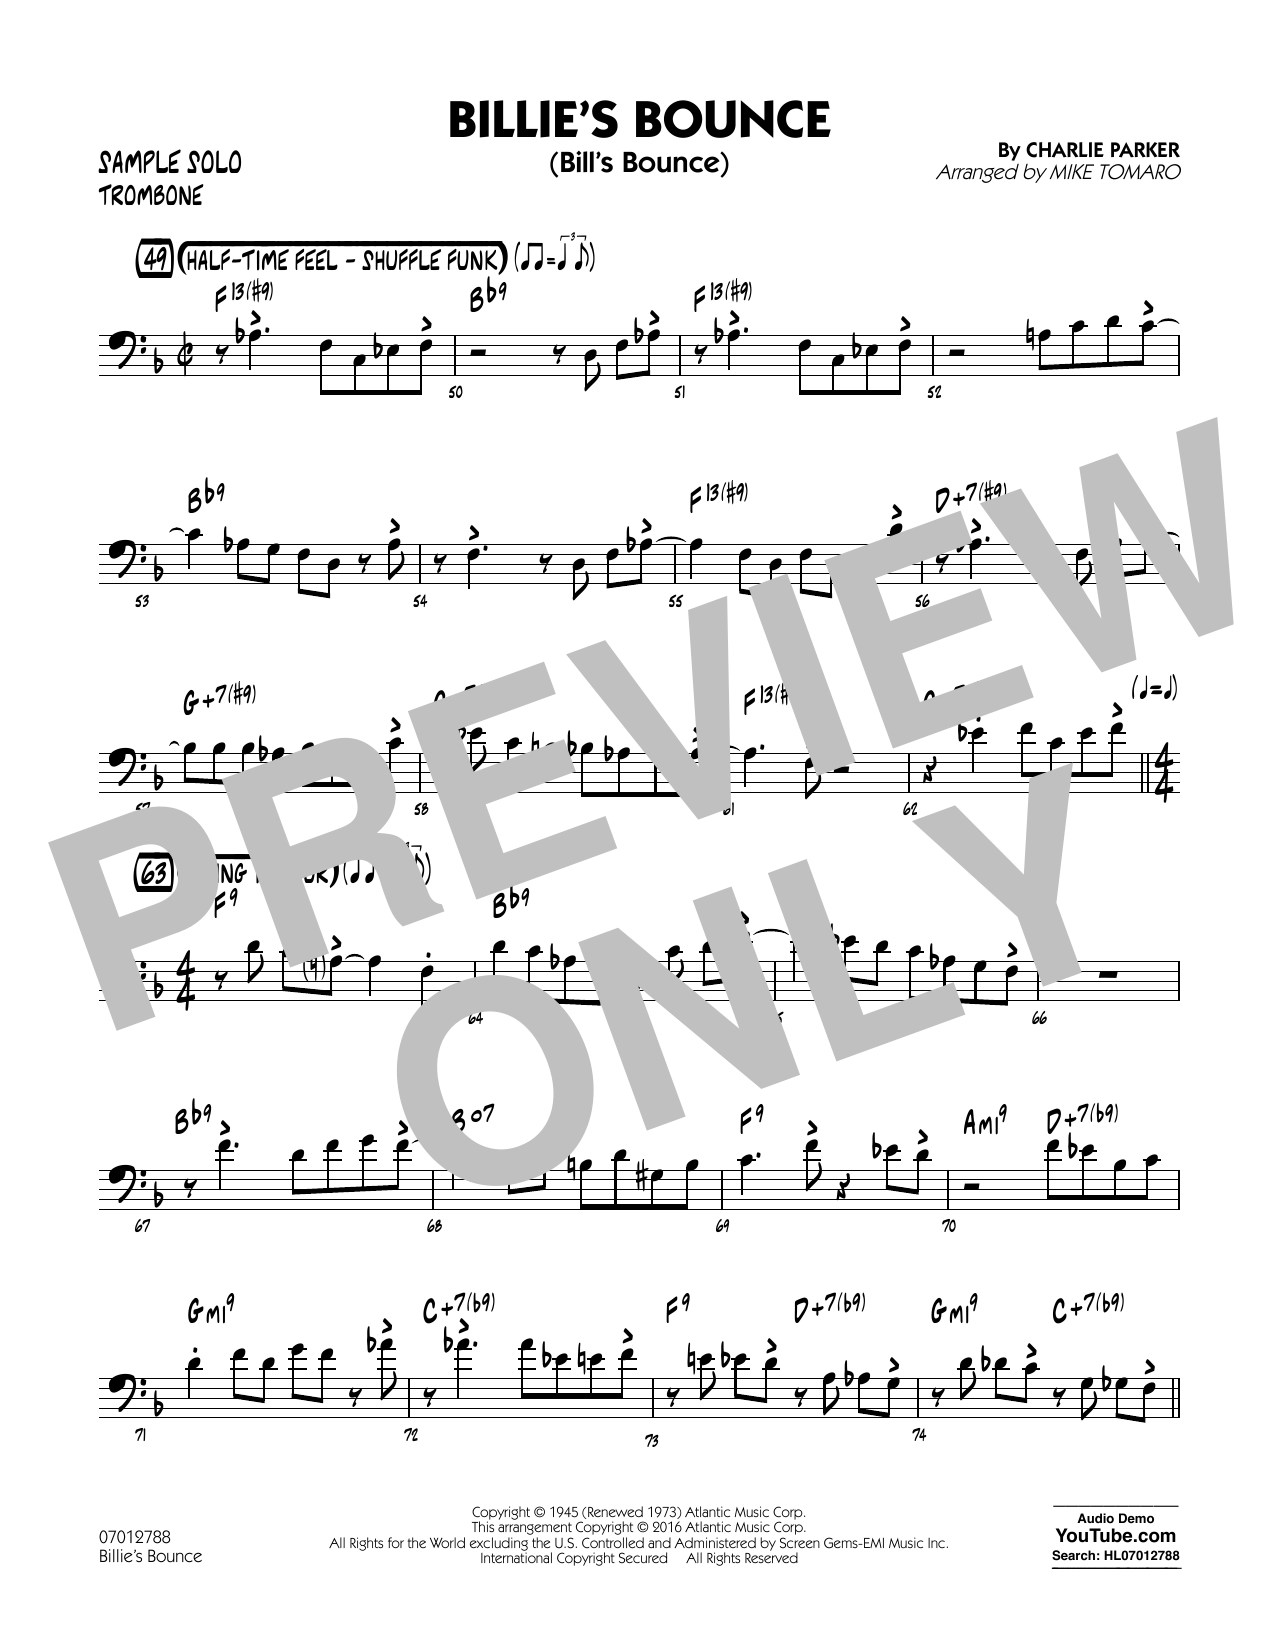 Billie's Bounce - Trombone Sample Solo